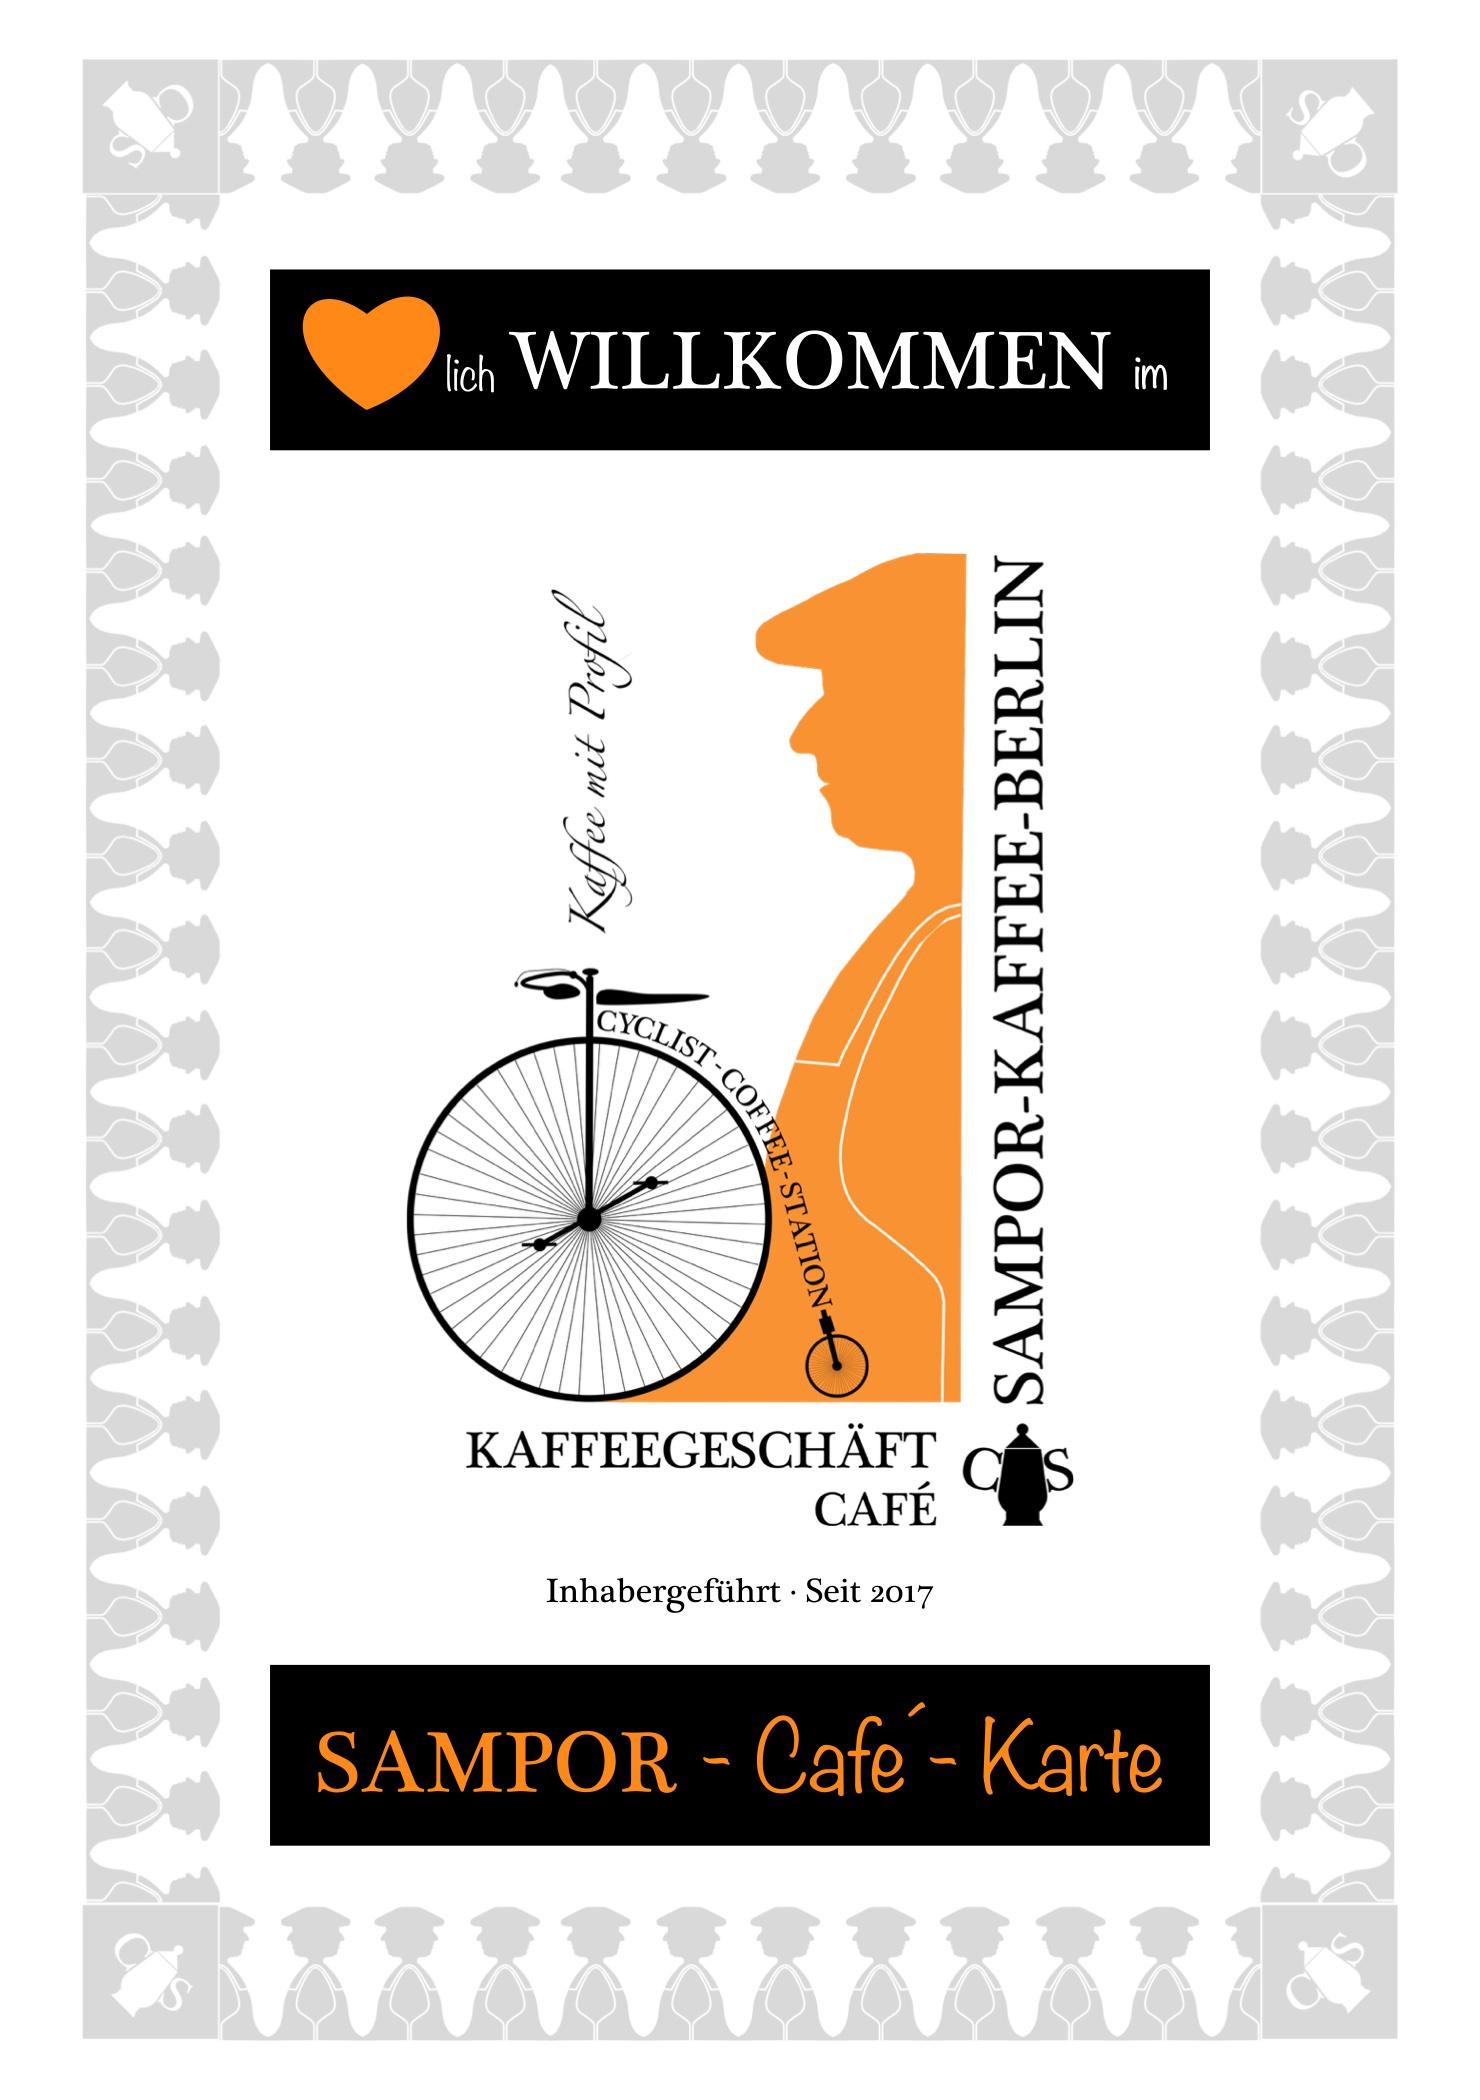 Speisekarte, Getränkekarte, SAMPOR-KAFFEE-BERLIN , Tegel, Café, Kaffeerösterei